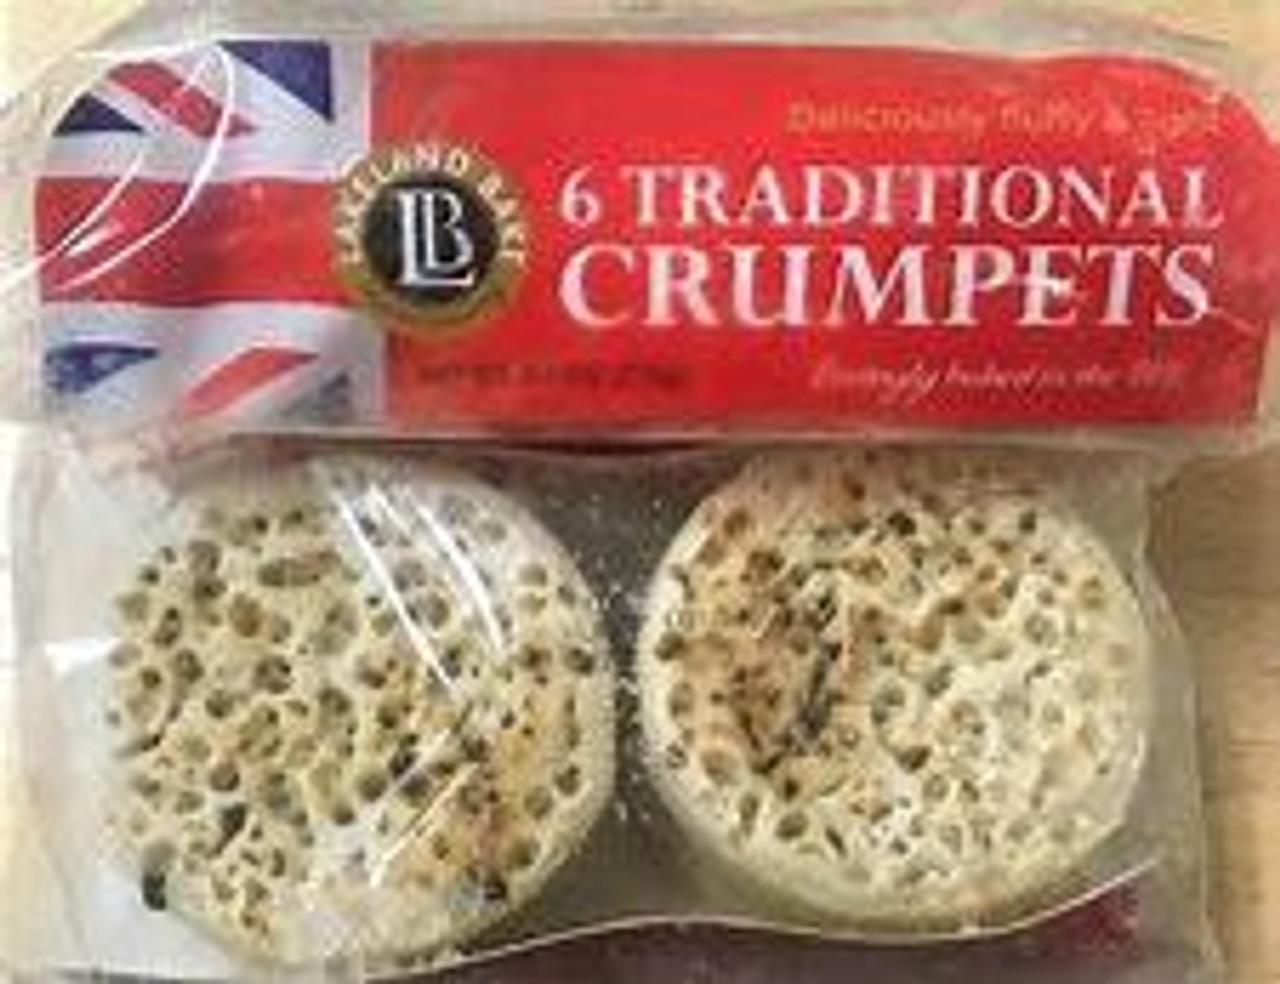 Lakeland Bake Crumpets, 6 Pack